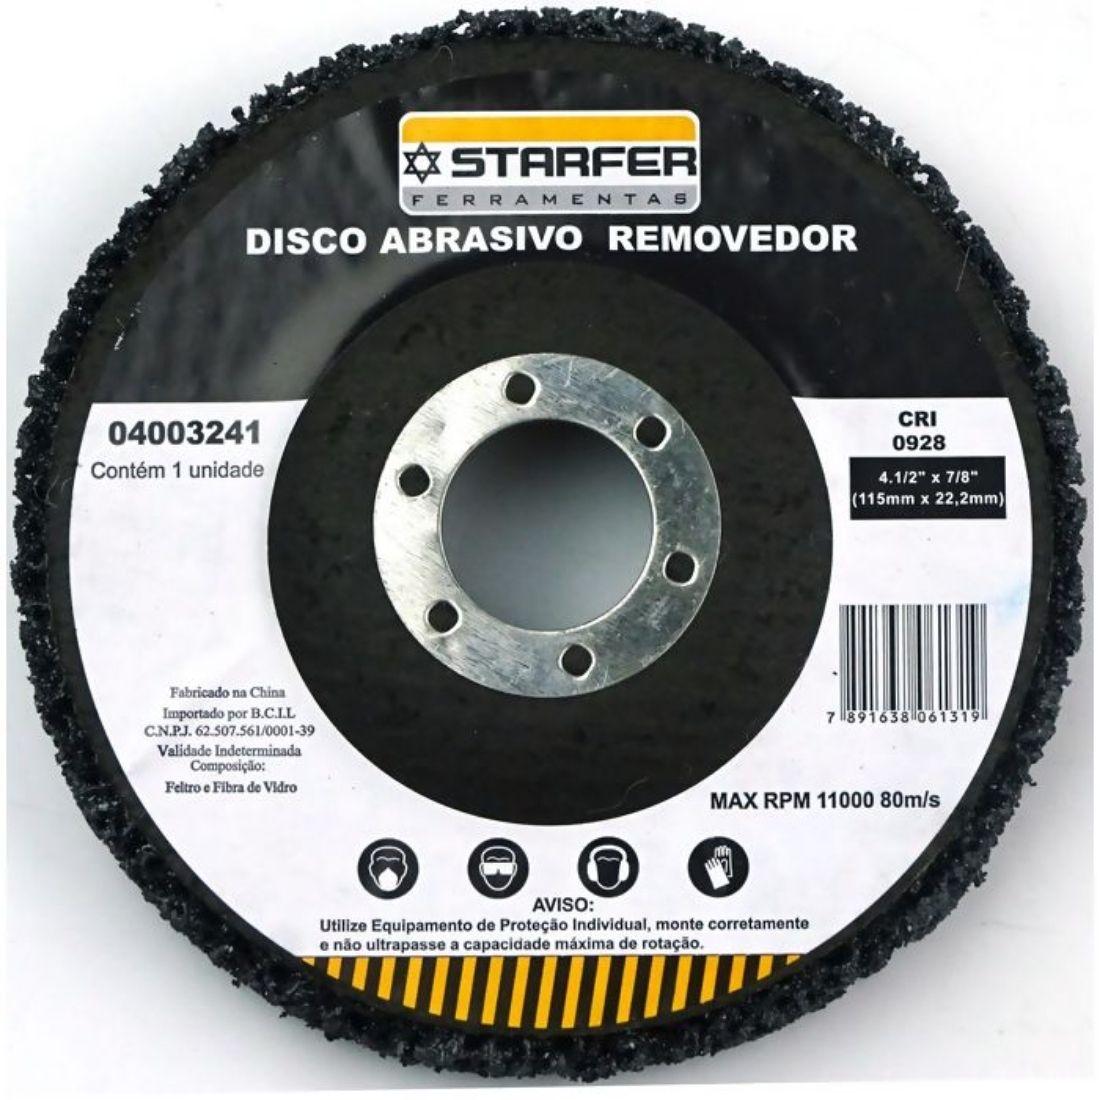 Disco Removedor Polidor 4.1/2 Starfer